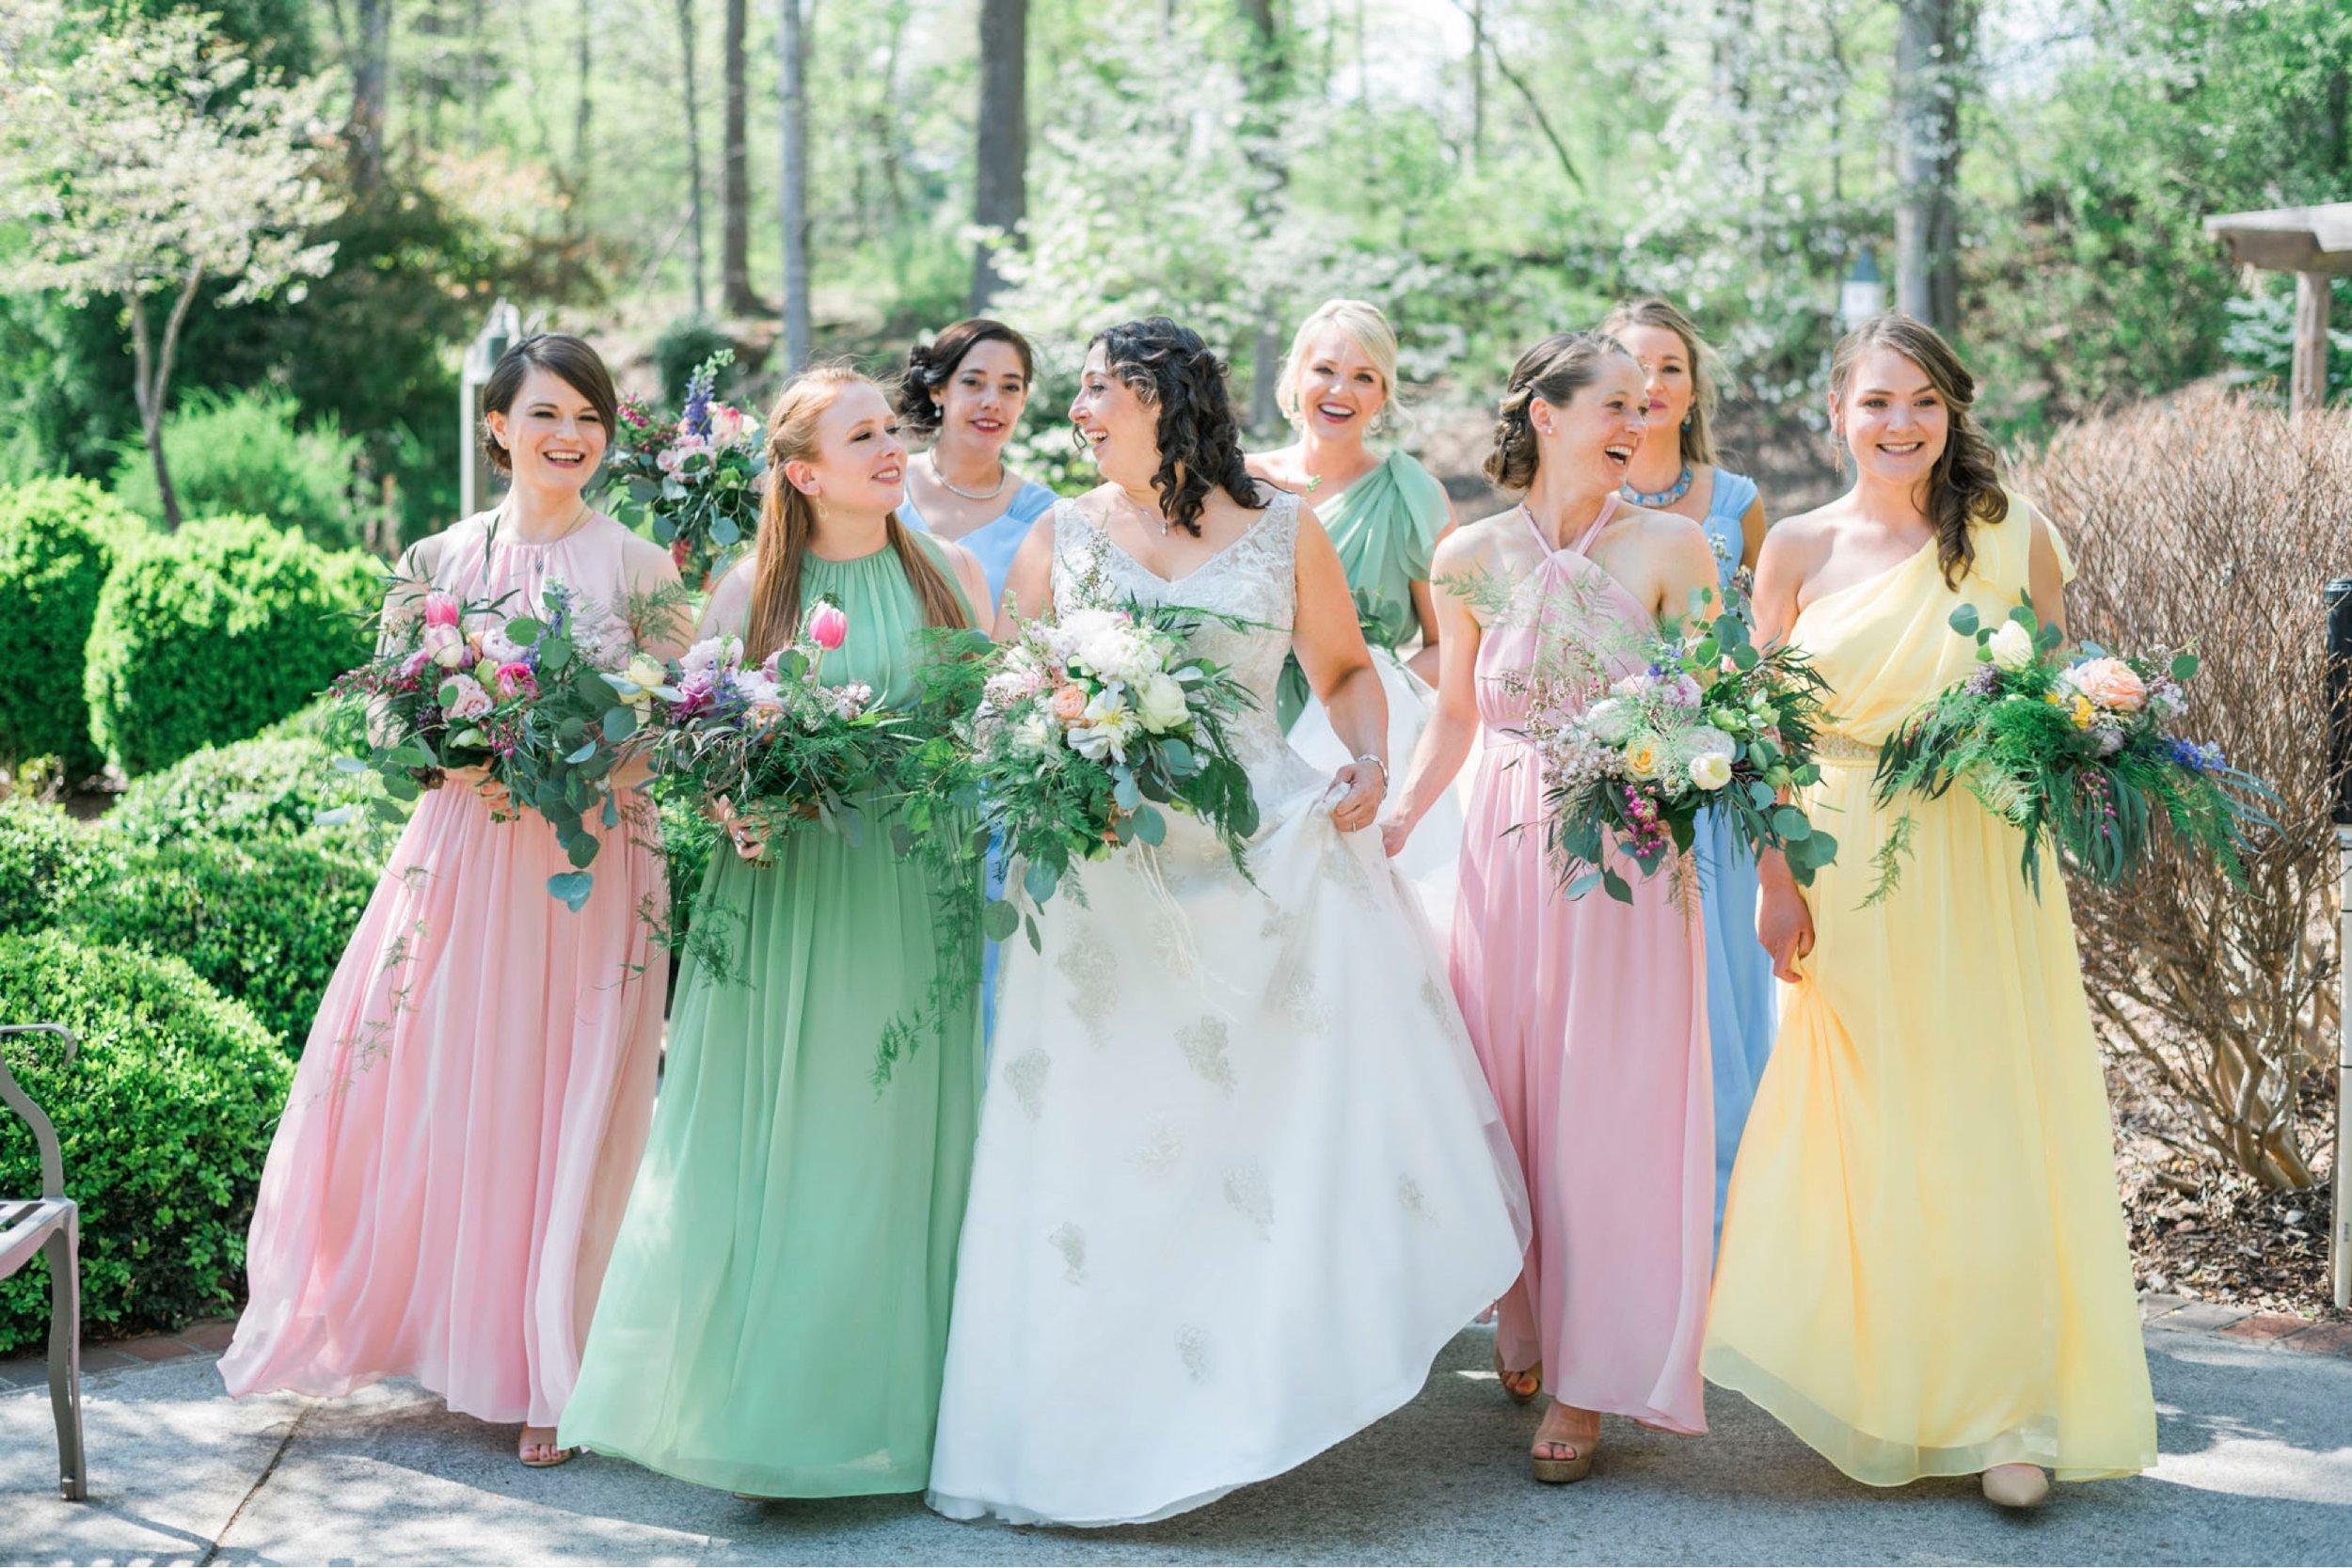 TheVirginianHotel_LynchburgVA_TheVirginianHotelWedding_Virginiaweddingphotographer_Lynchburgvawedding 39.jpg